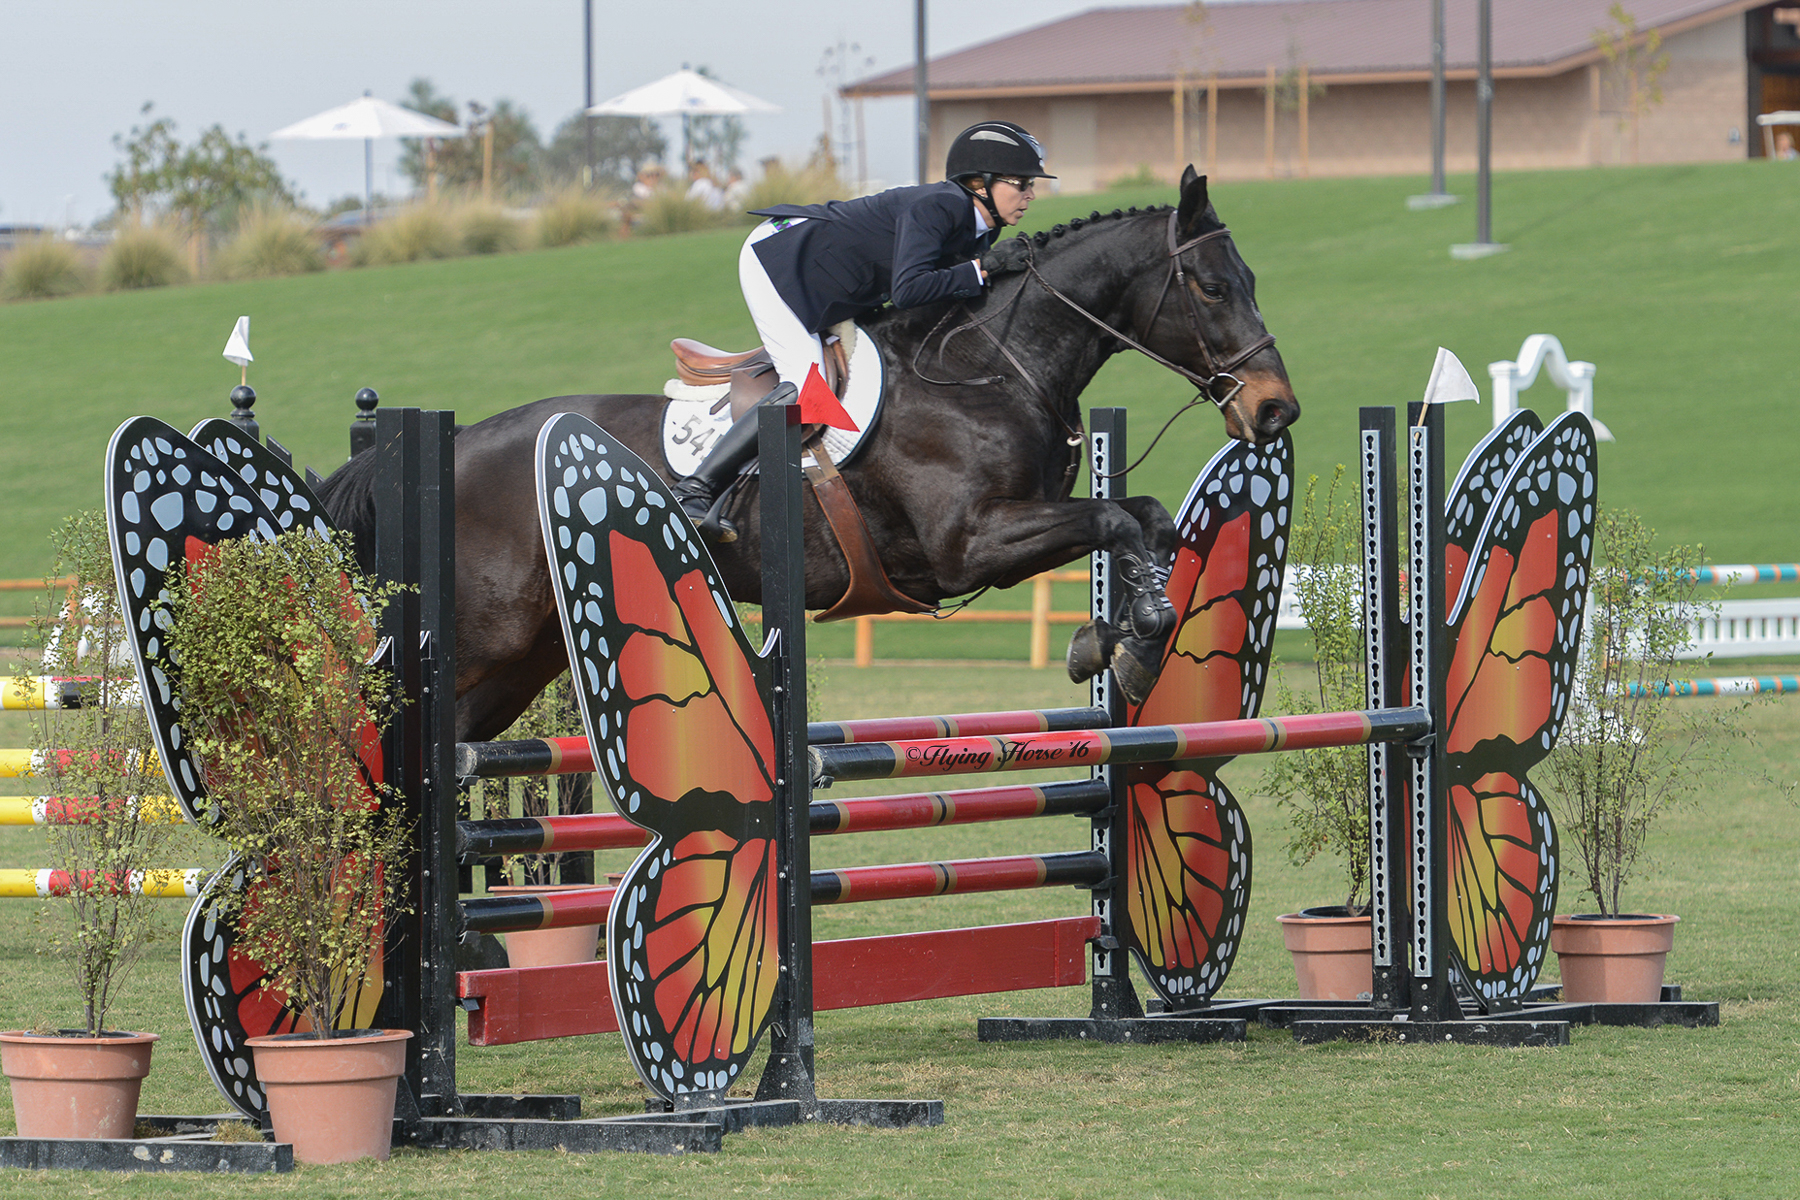 Dardam Q at the Central California Classic Horse Show in Paso Robles.